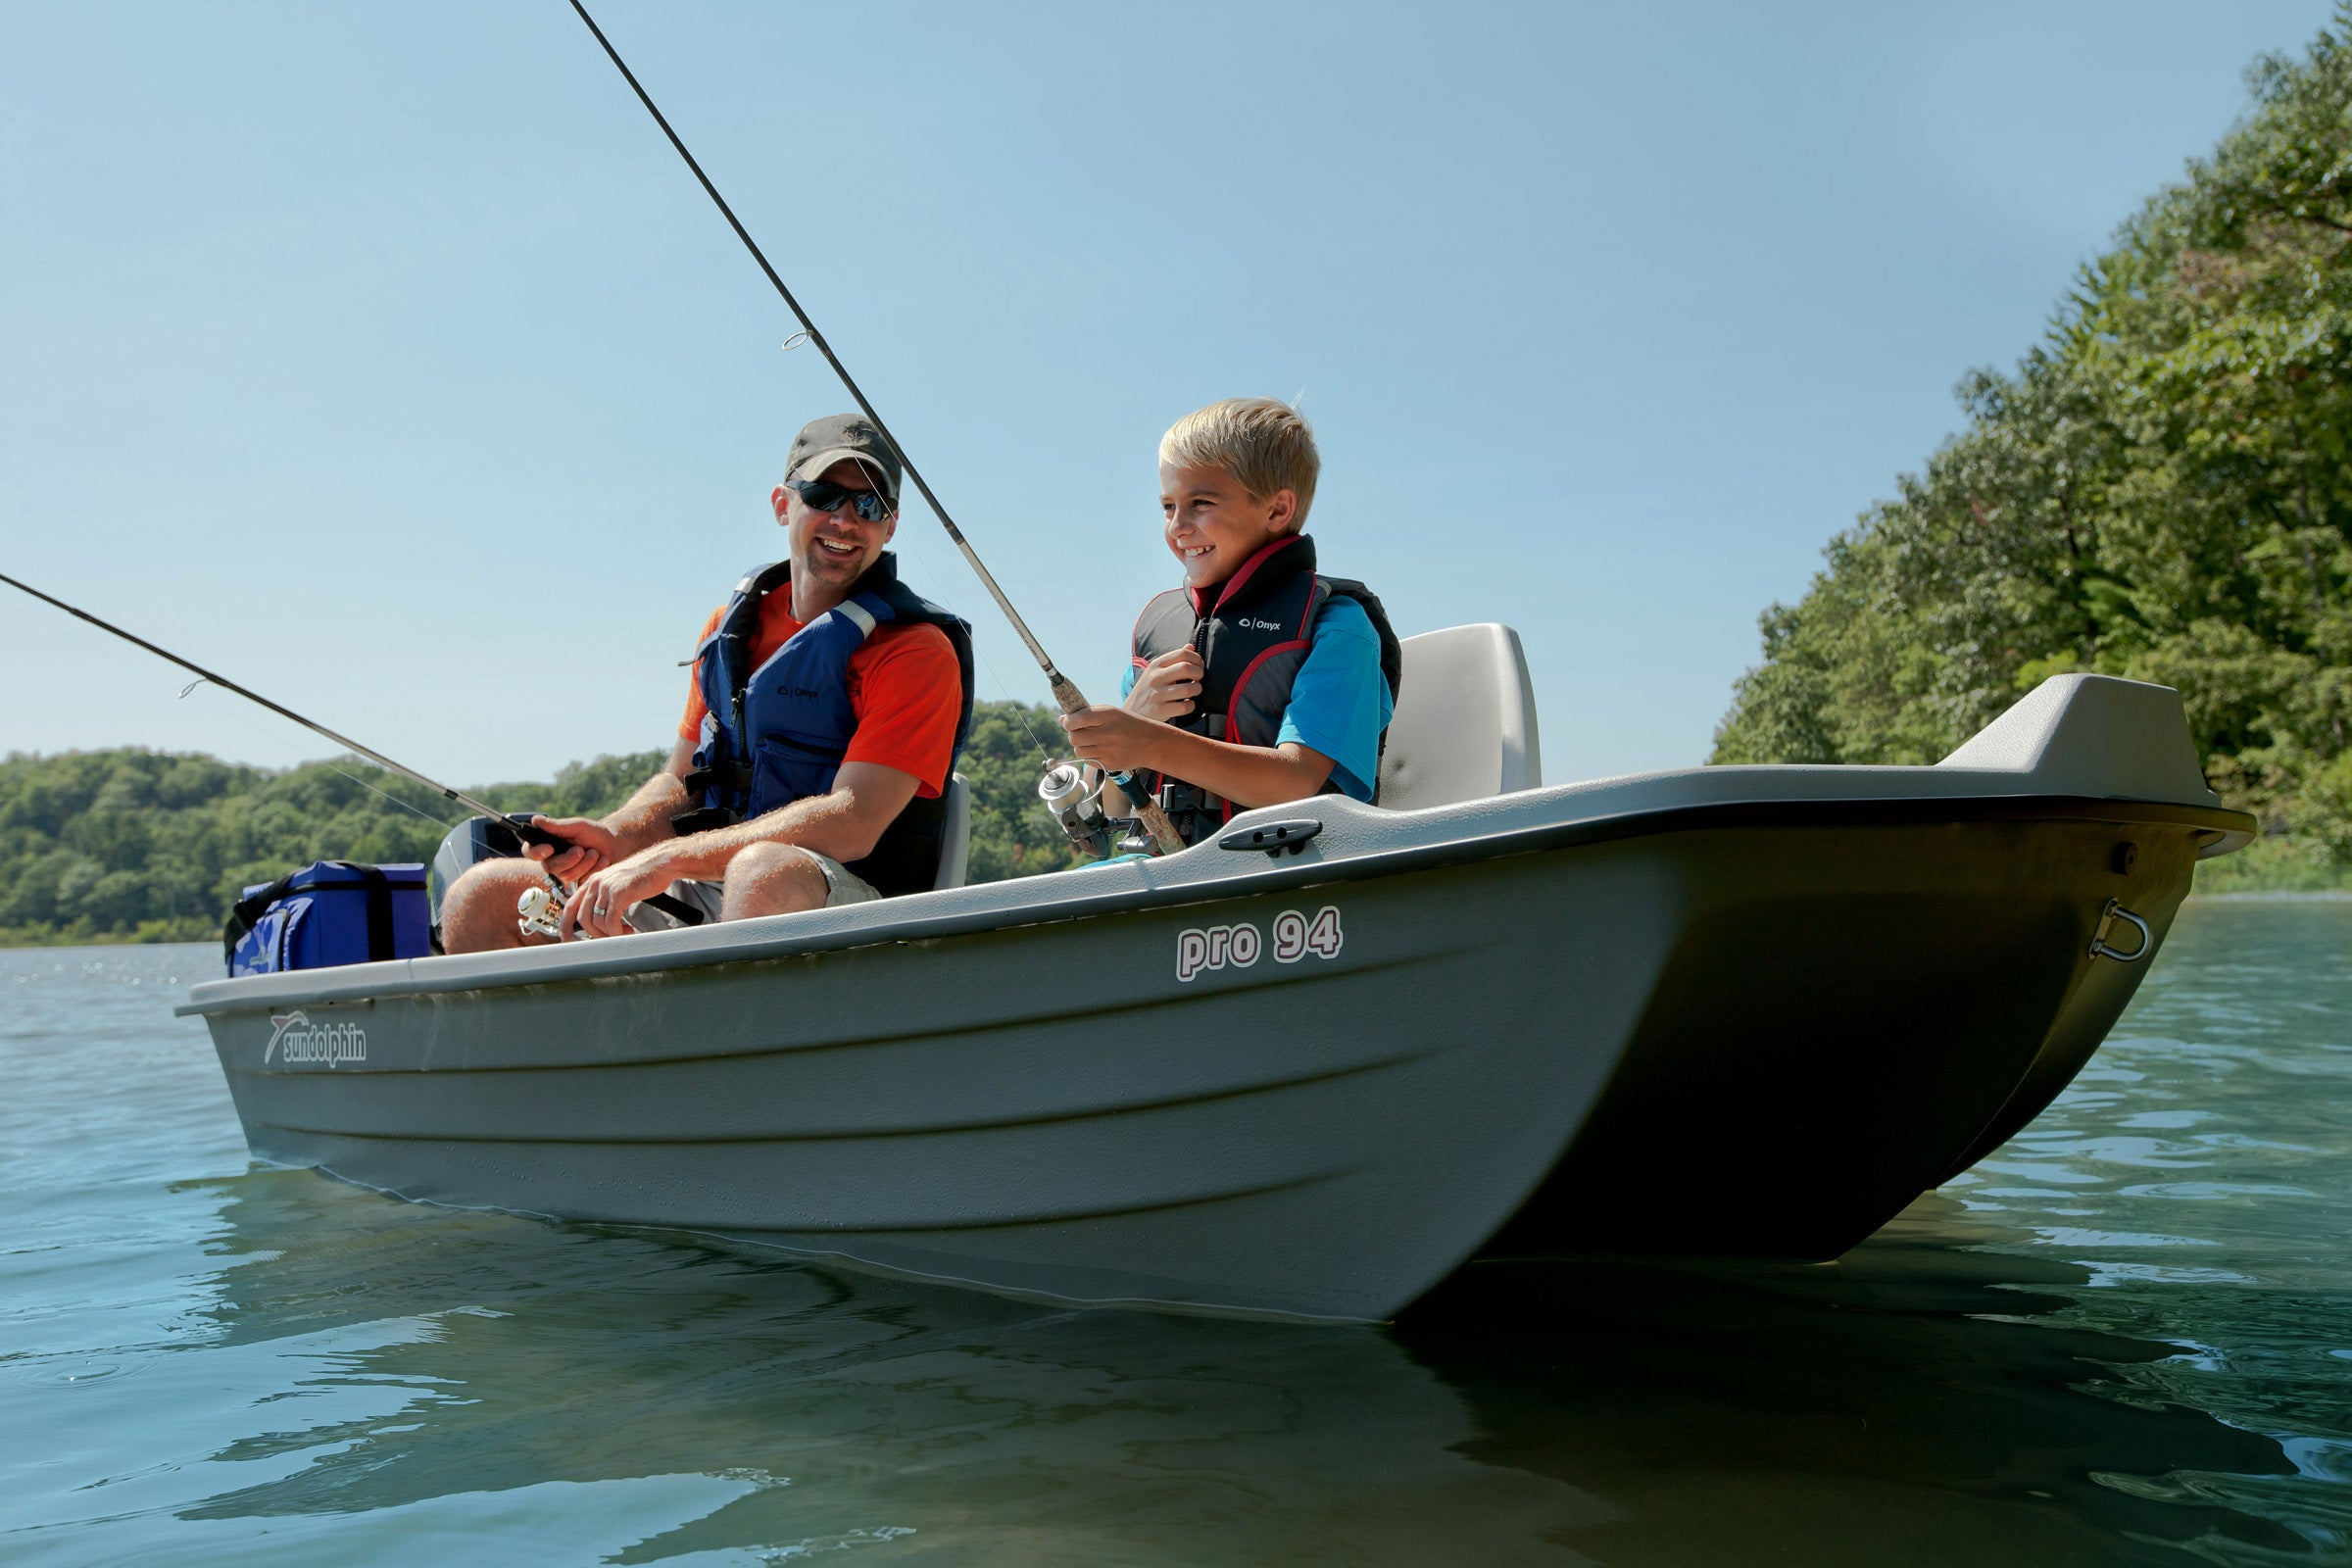 Best Sun Dolphin Sportsman Boat Rural King - Bella Esa